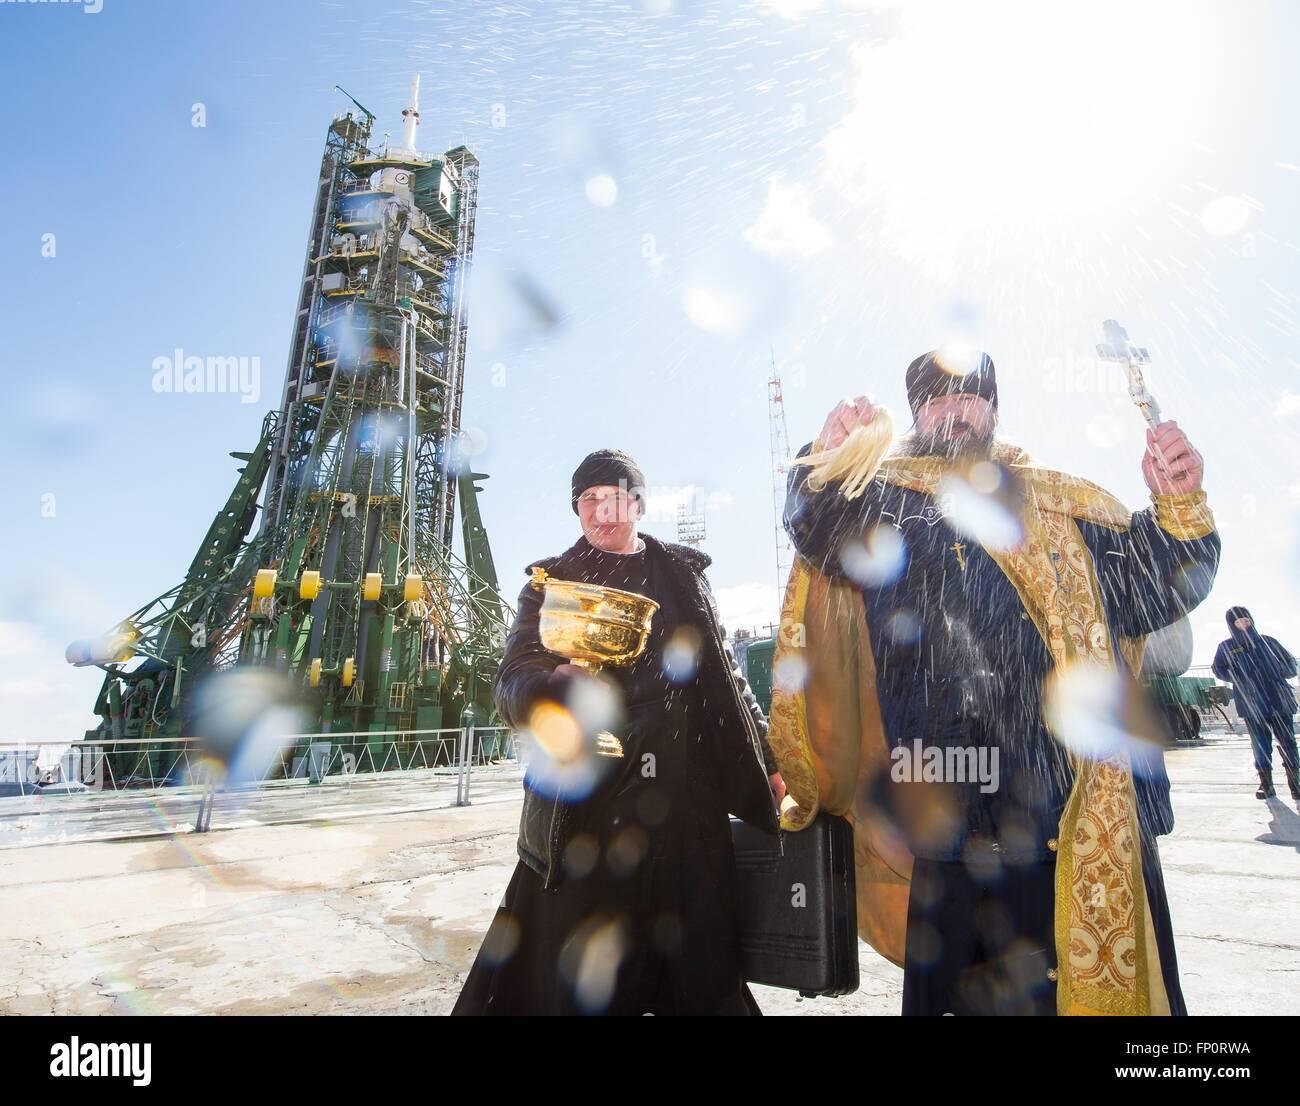 Baikonur Cosmodrome, Kazakhstan. 17th March, 2016. A Russian Orthodox priest blesses the Soyuz TMA-20M spacecraft Stock Photo